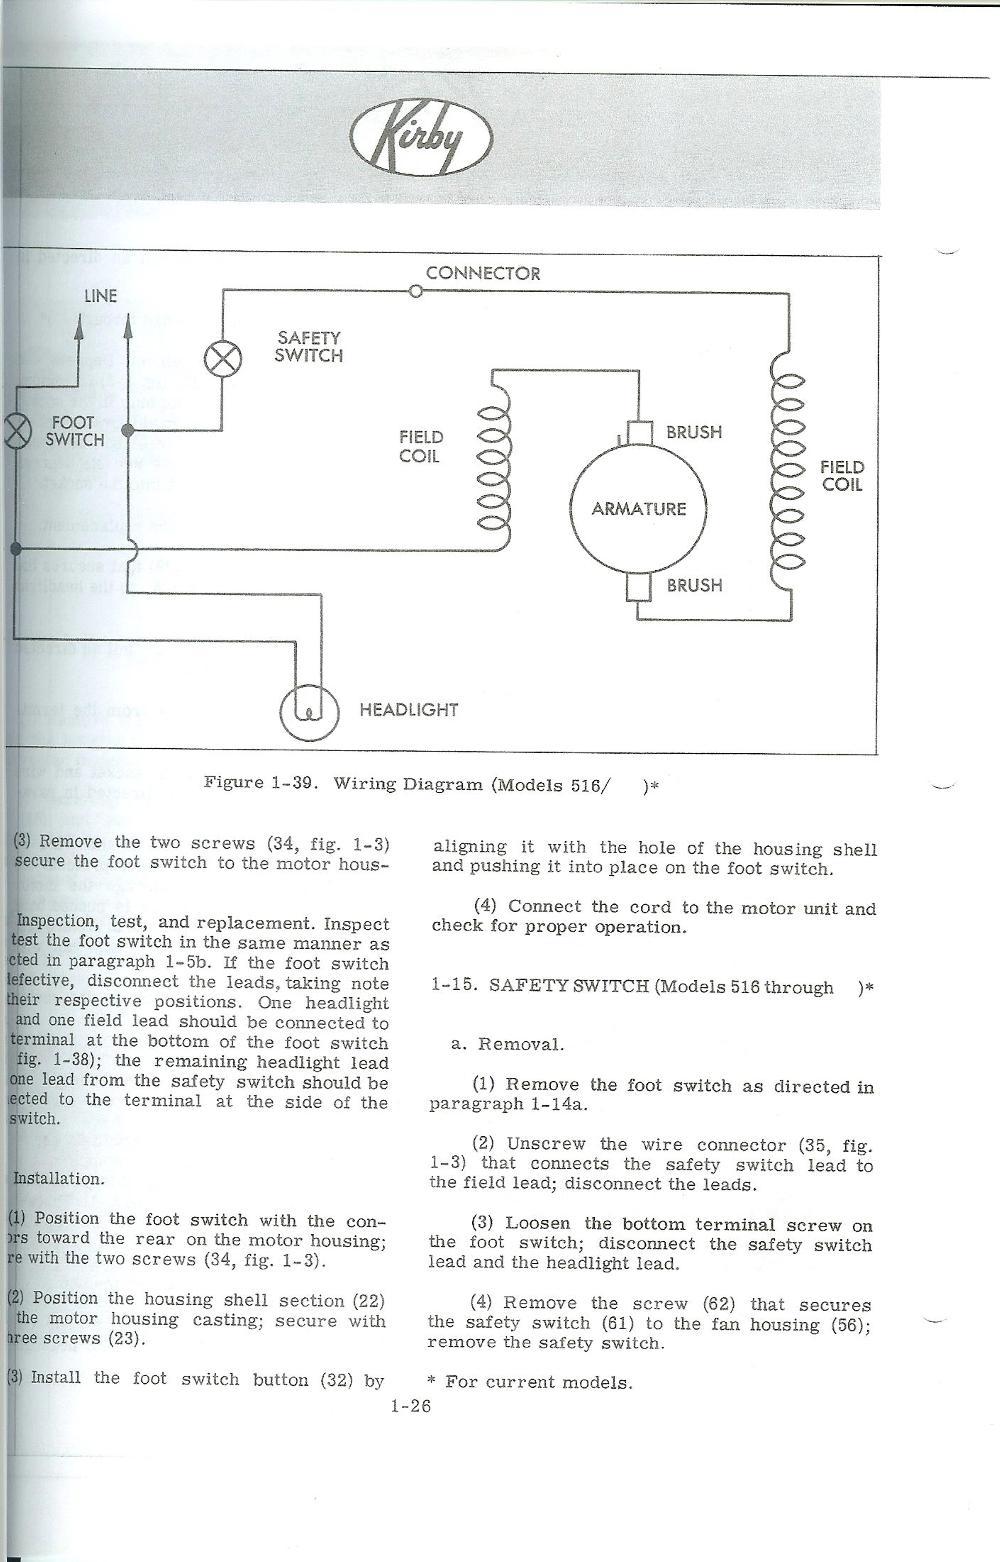 kirby 516 sanitronic vii wiring diagram. Black Bedroom Furniture Sets. Home Design Ideas